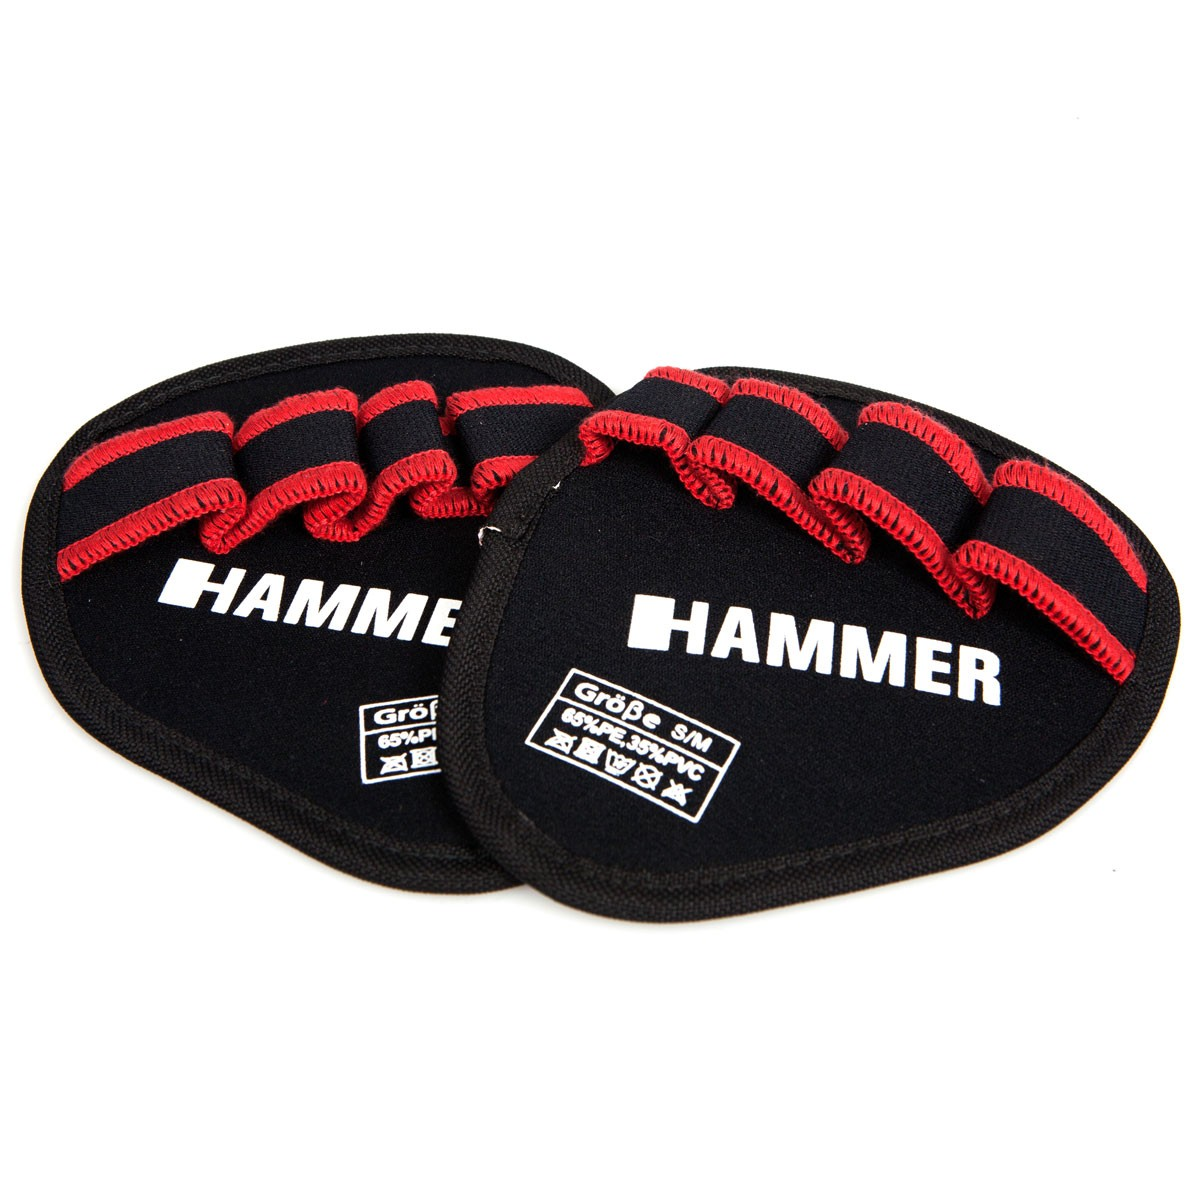 Hammer Grip Pad L-XL fogópárna - Gorillasport.hu